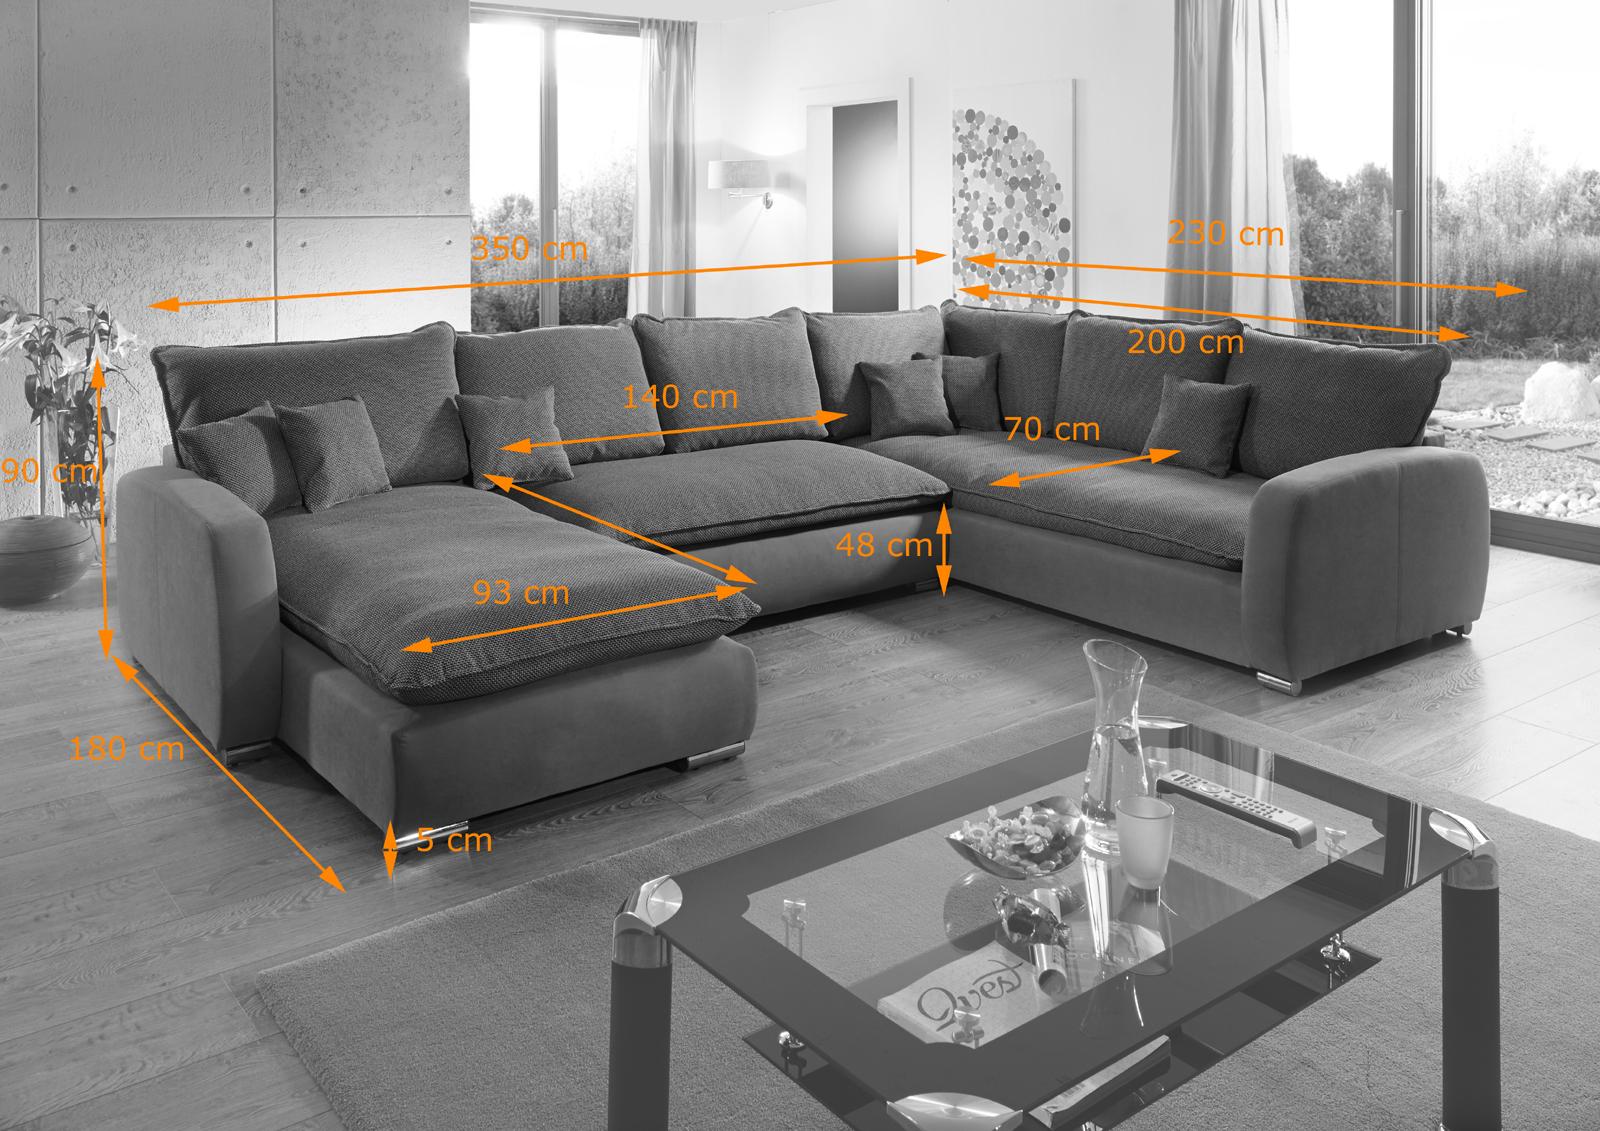 Sam sofa grau wohnlandschaft scala 180 x 350 x 230 cm for Sam wohnlandschaft